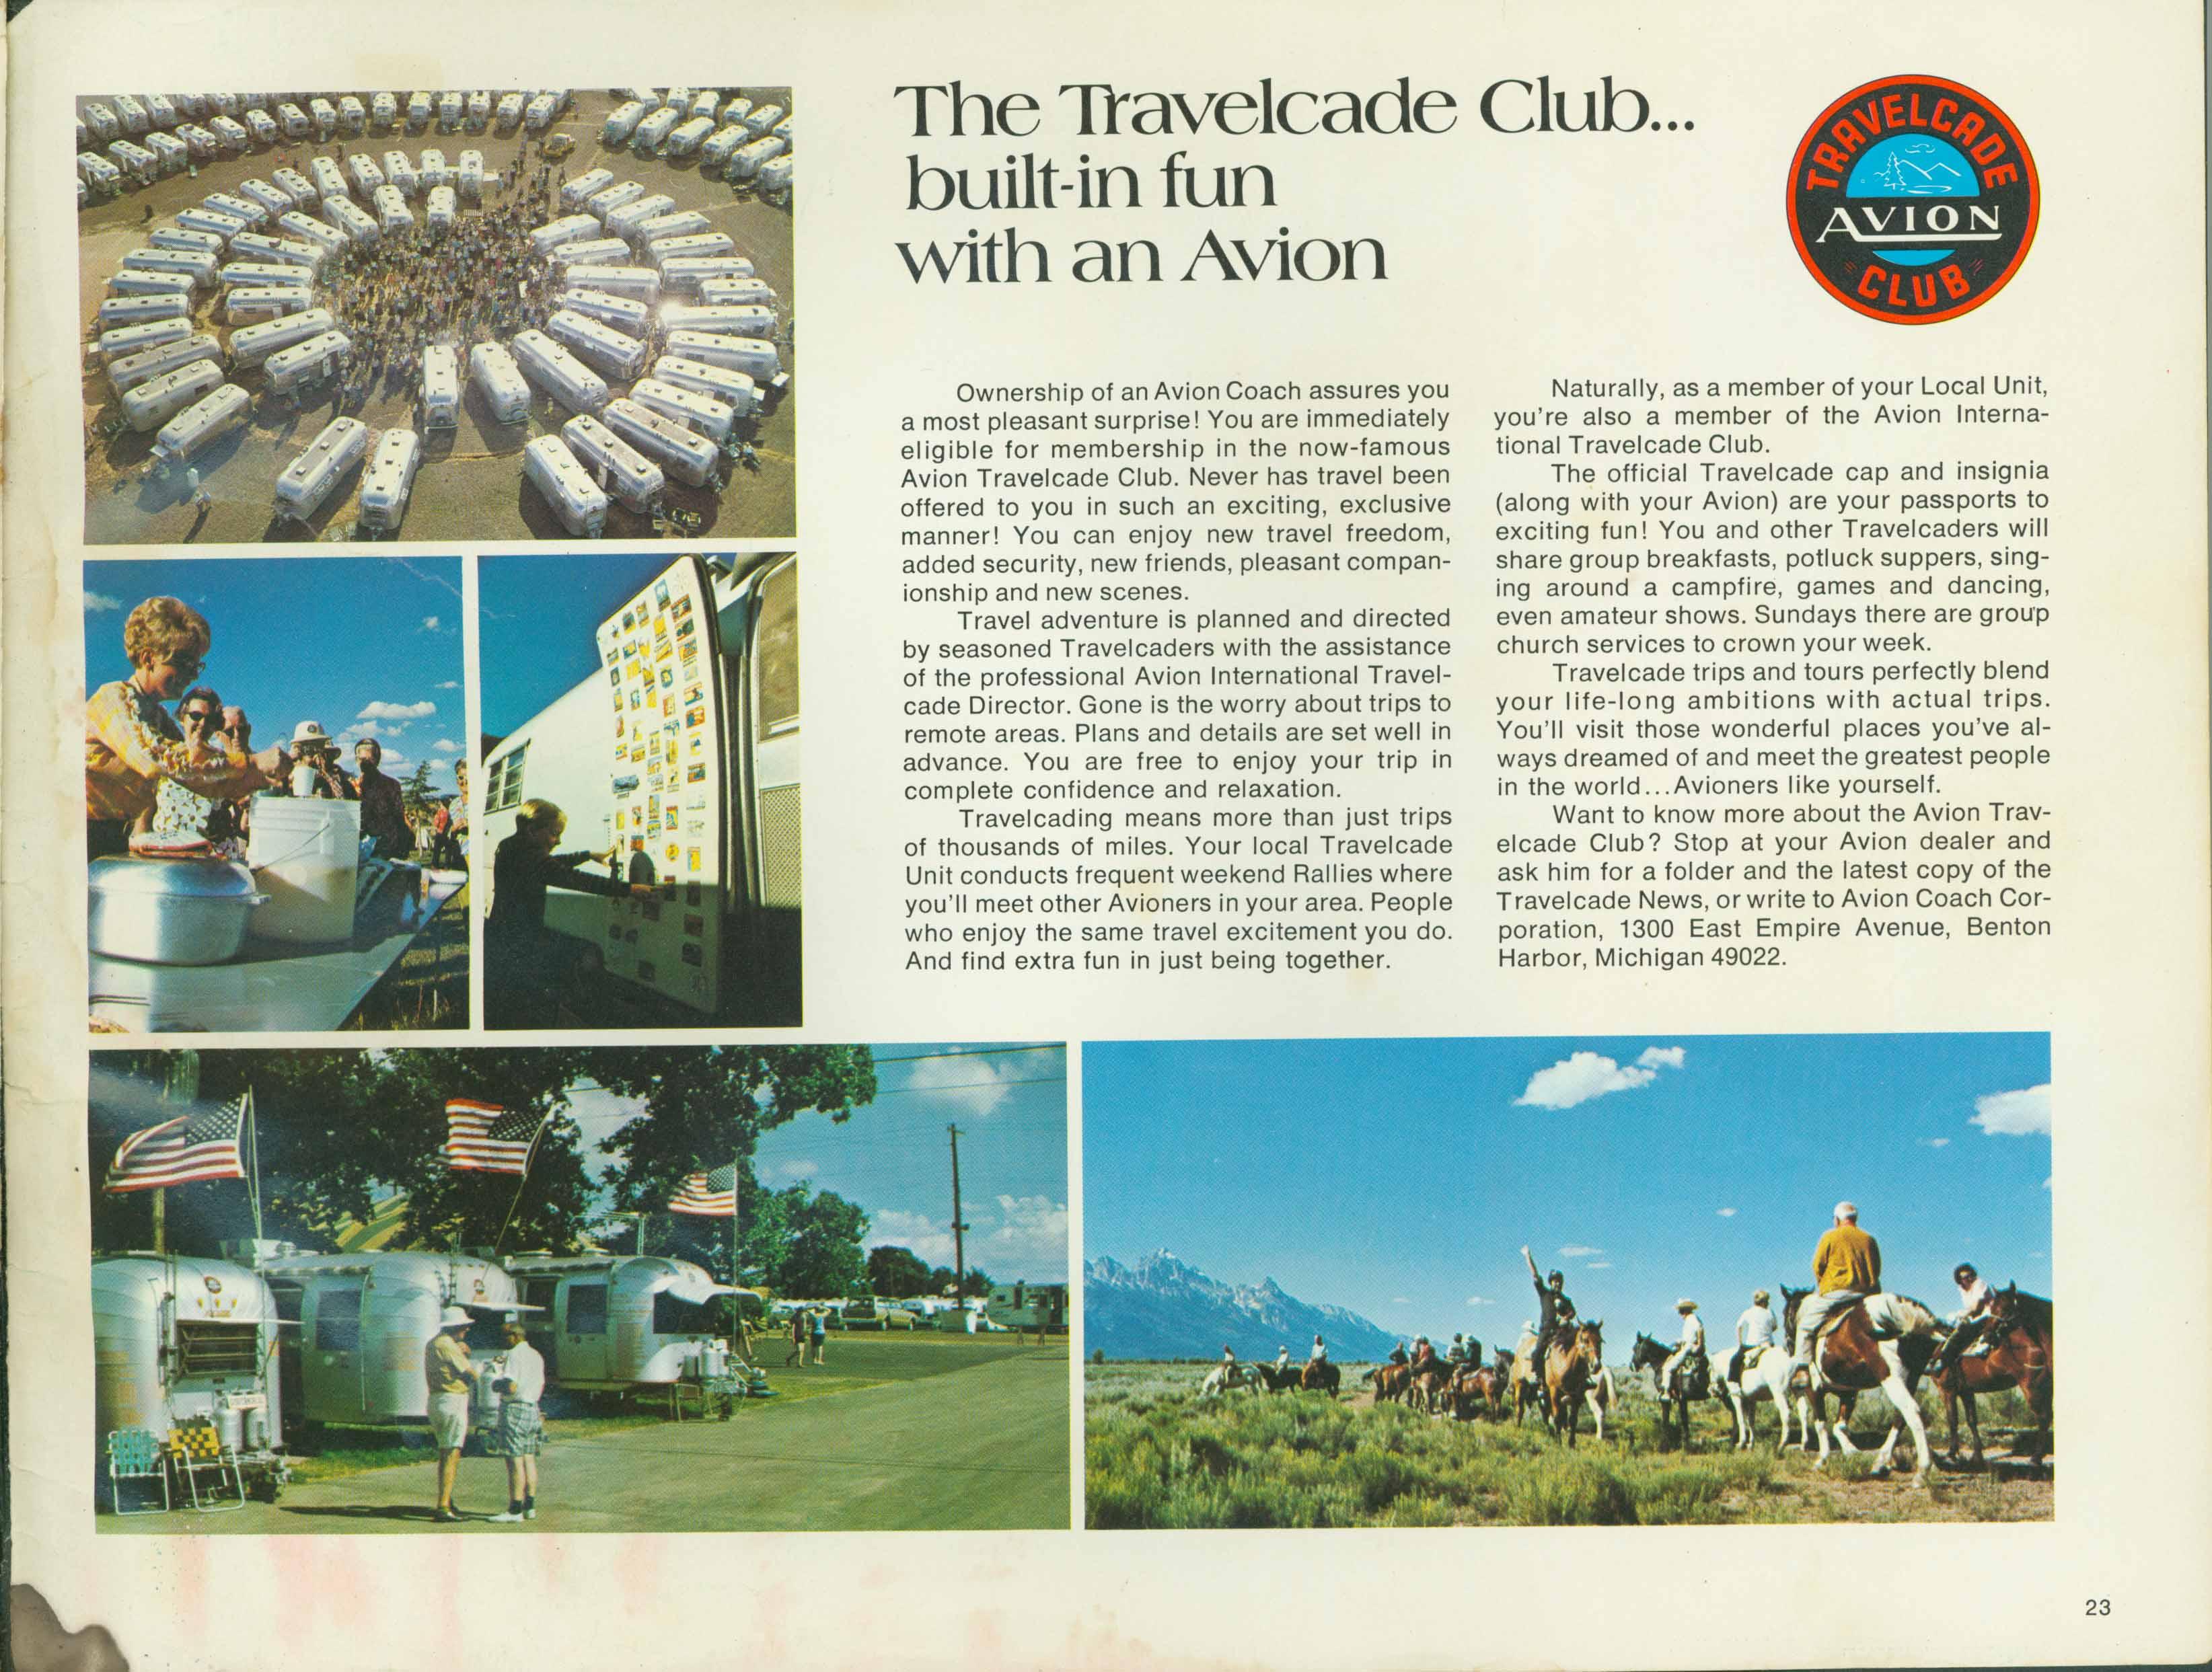 1972_AVION_23- big rally ariel view, plus other pics